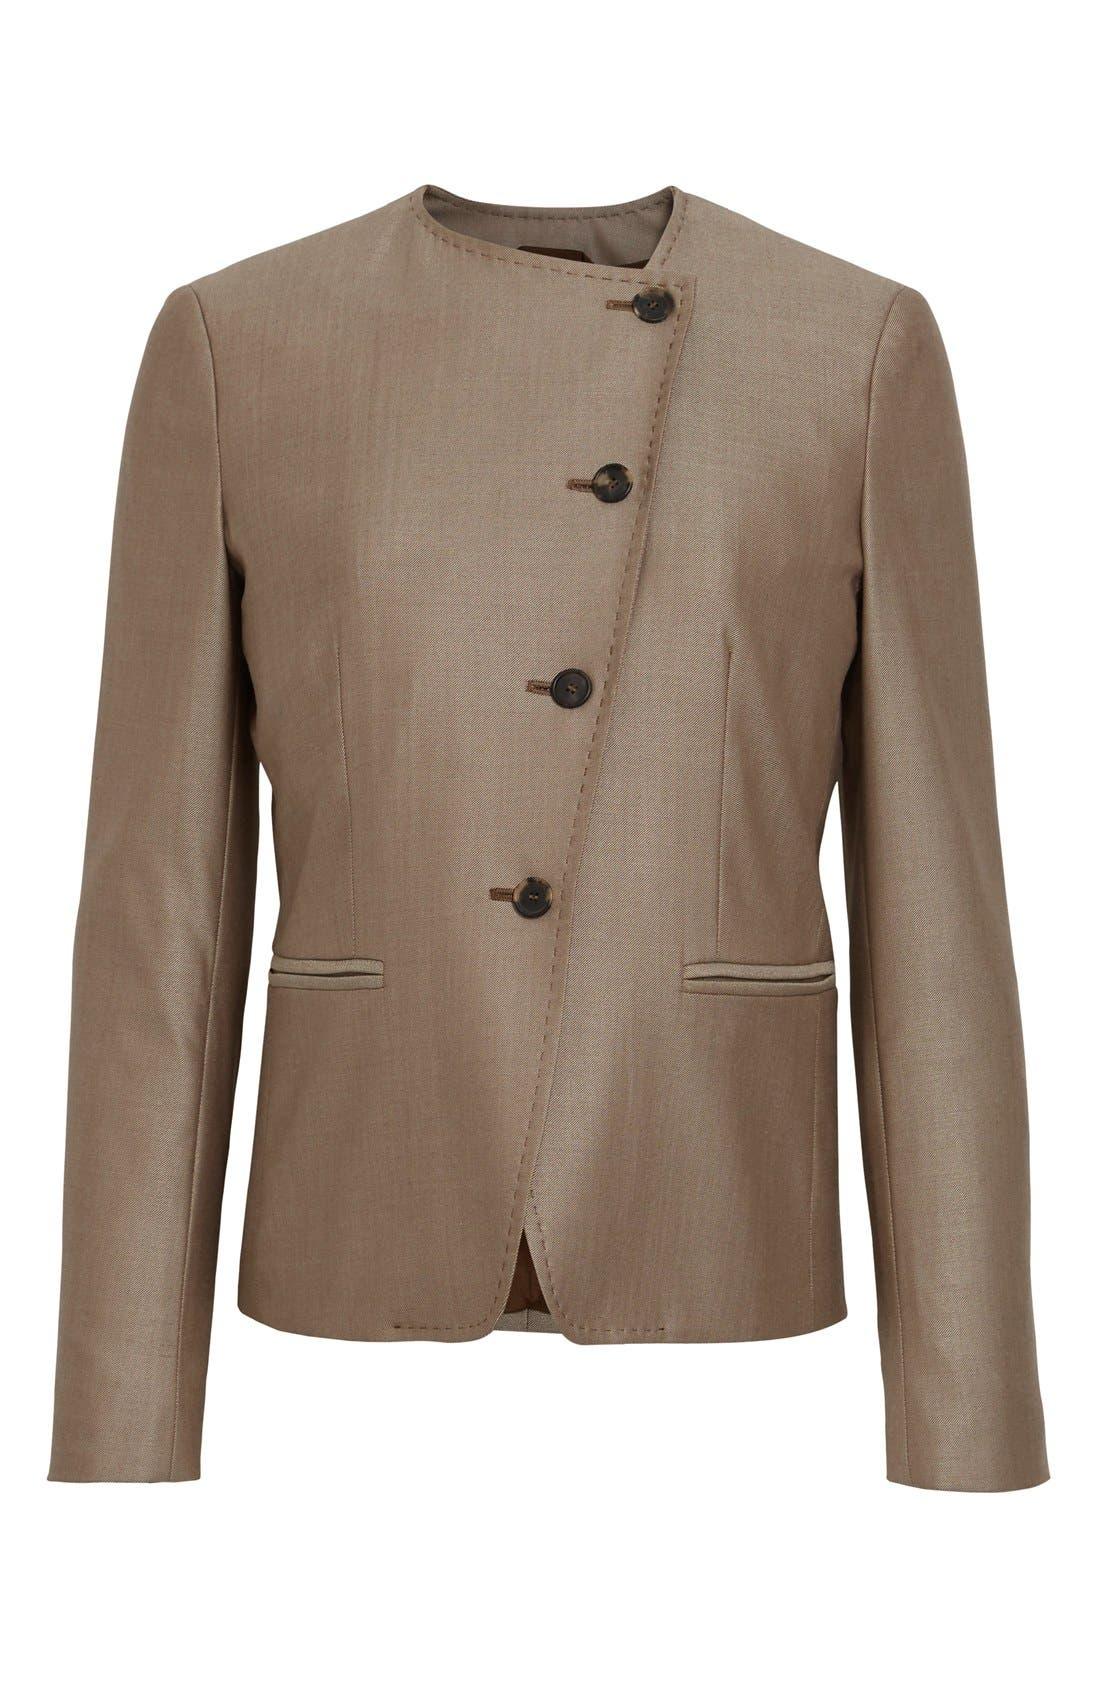 Erba Asymmetrical Jacket,                             Alternate thumbnail 10, color,                             220